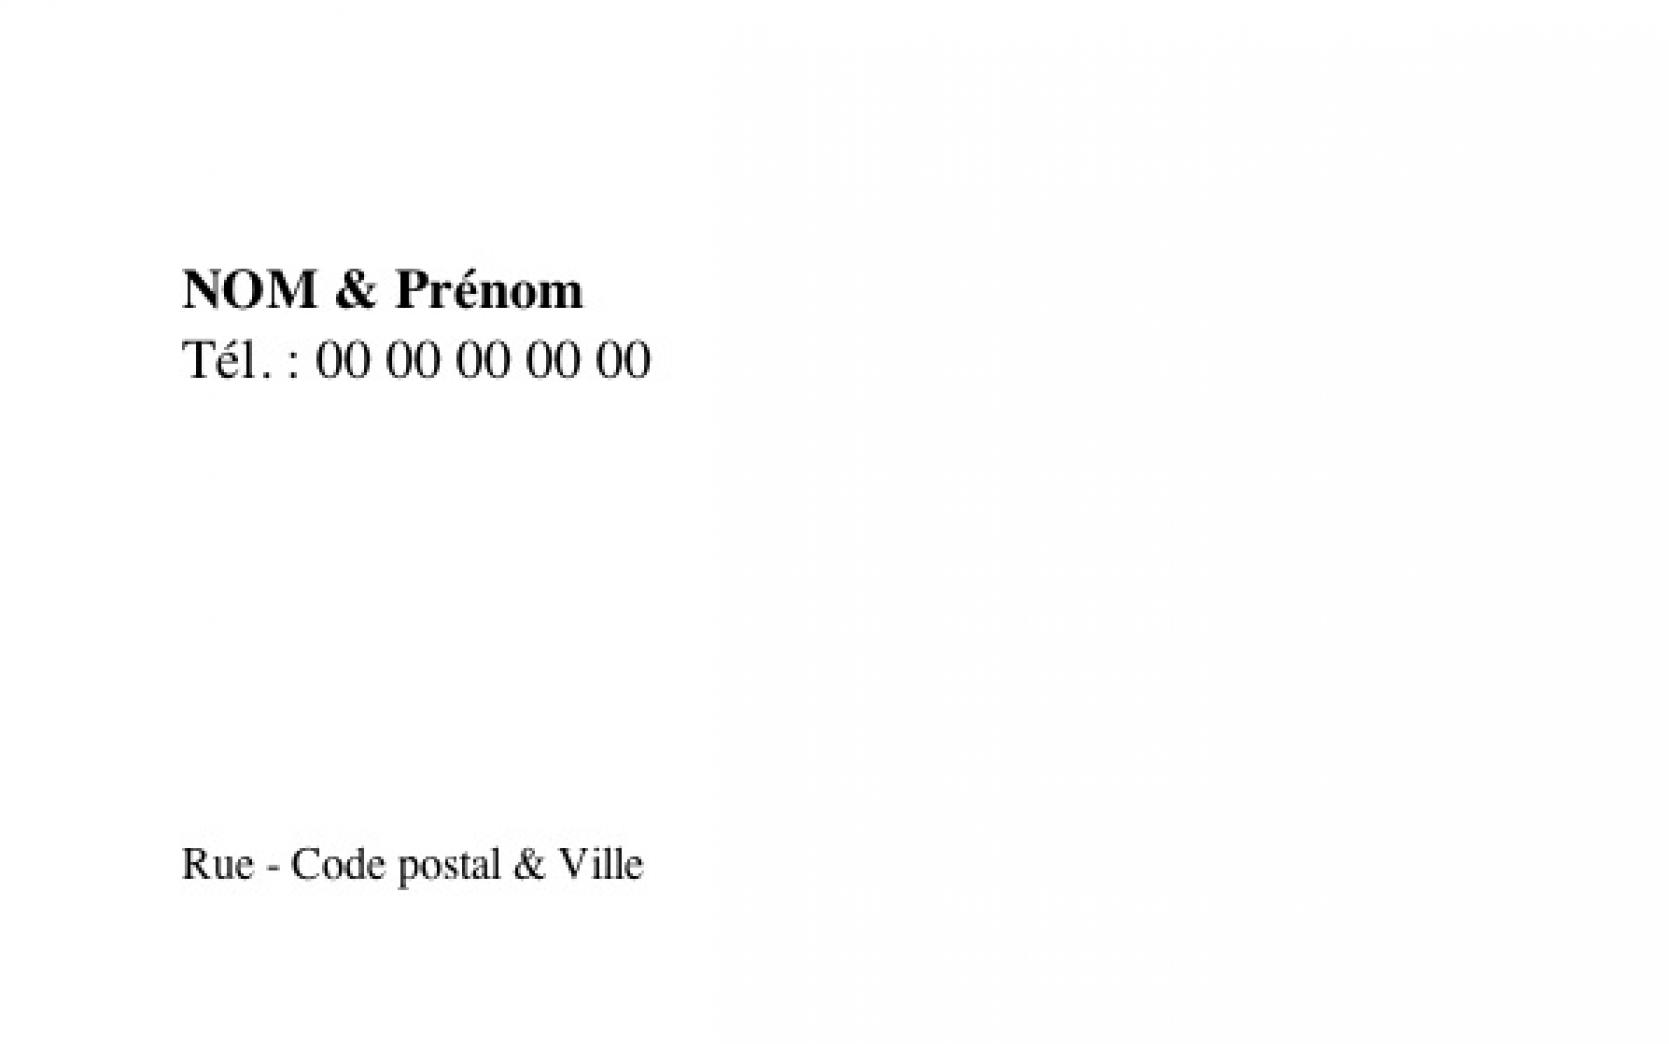 Connu Carte de visite Familiale Grand Format | Carte Perso | Vierge Blanche PU81